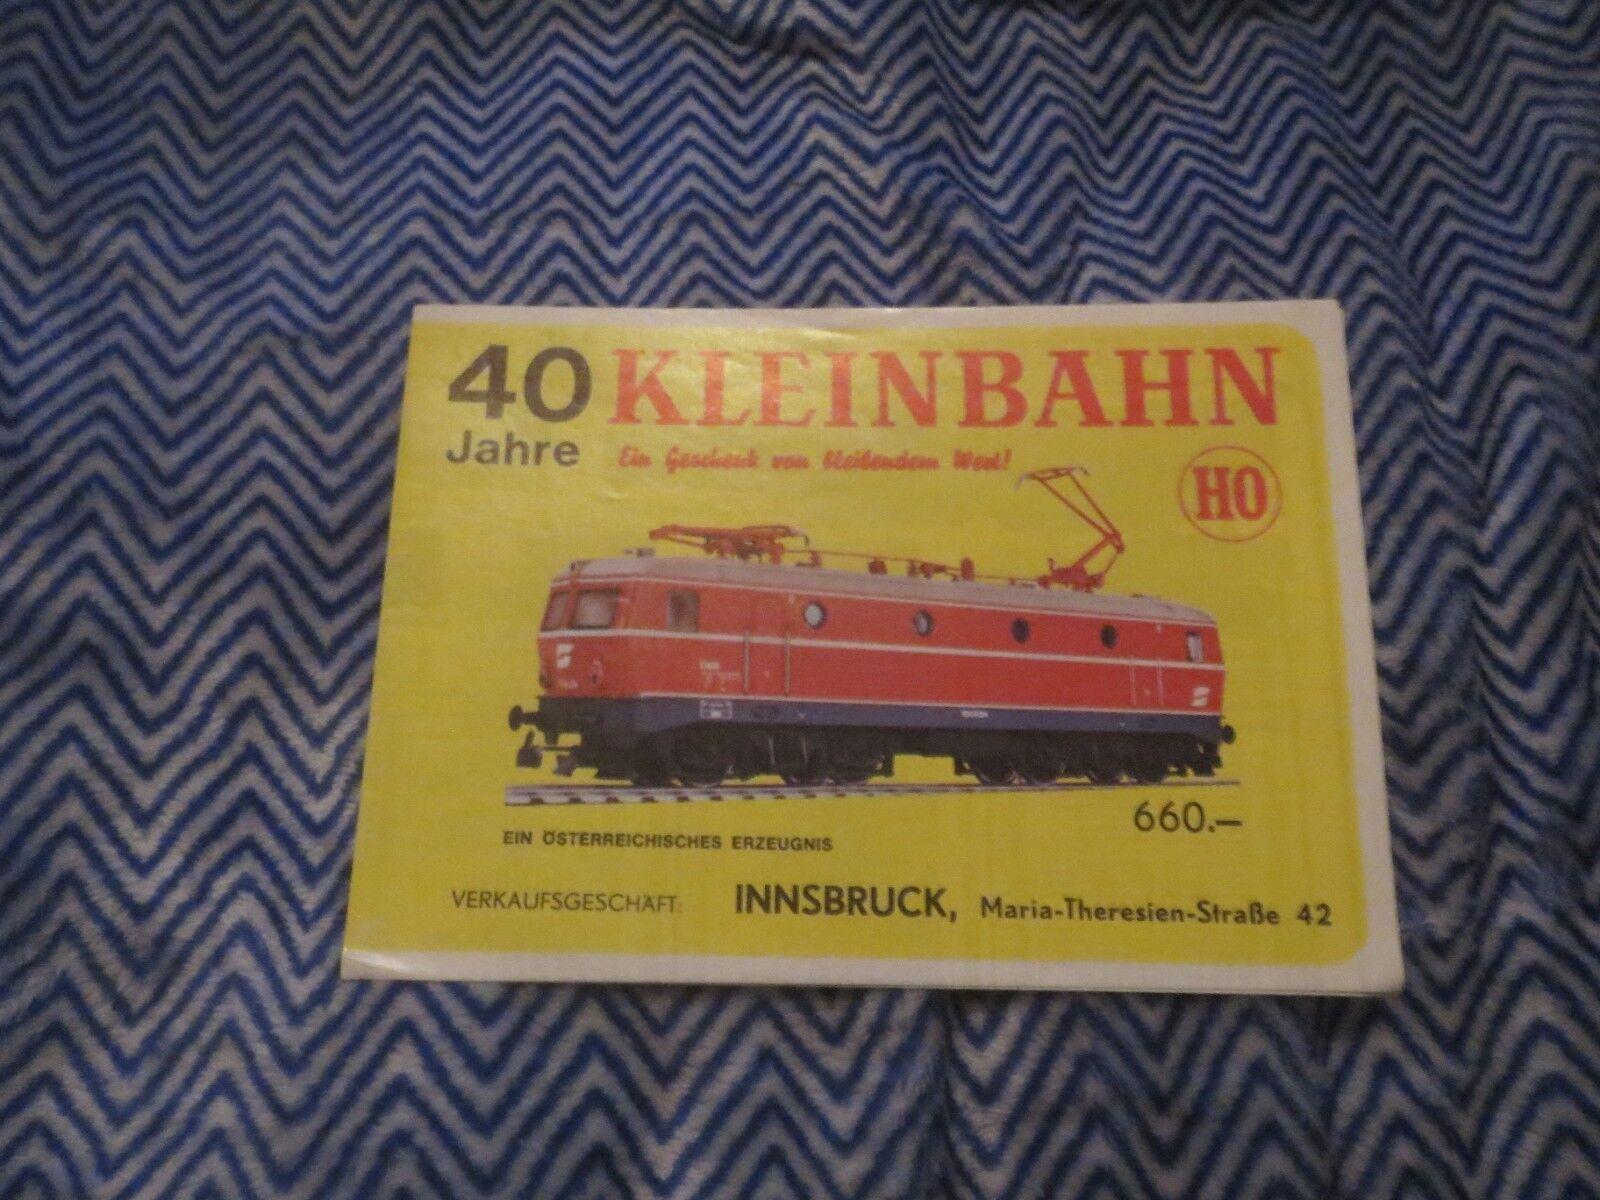 40 KLEINBAHN JAHRE HO MODEL TRAIN TRAINS SALES BROCHURE ORIGINAL GERMAN VINTAGE